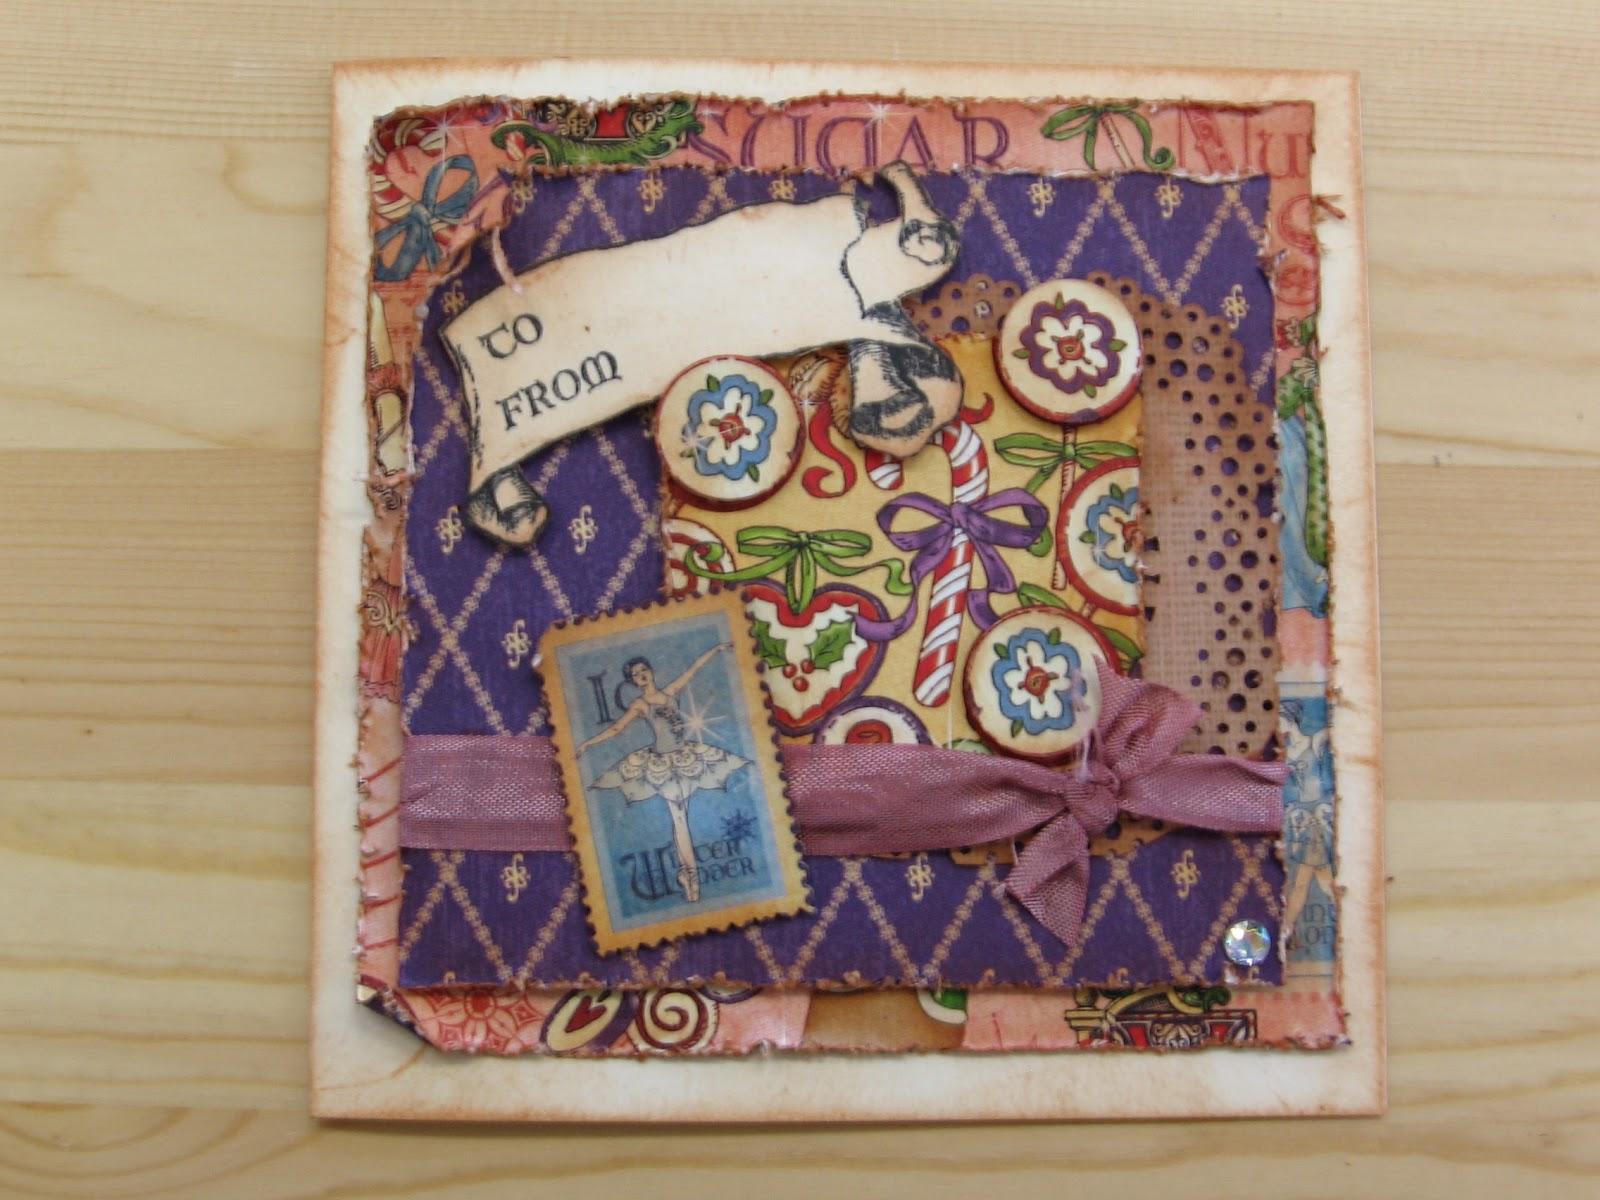 My Stamping Studio: VINTAGE NUTCRACKER CHRISTMAS CARDS